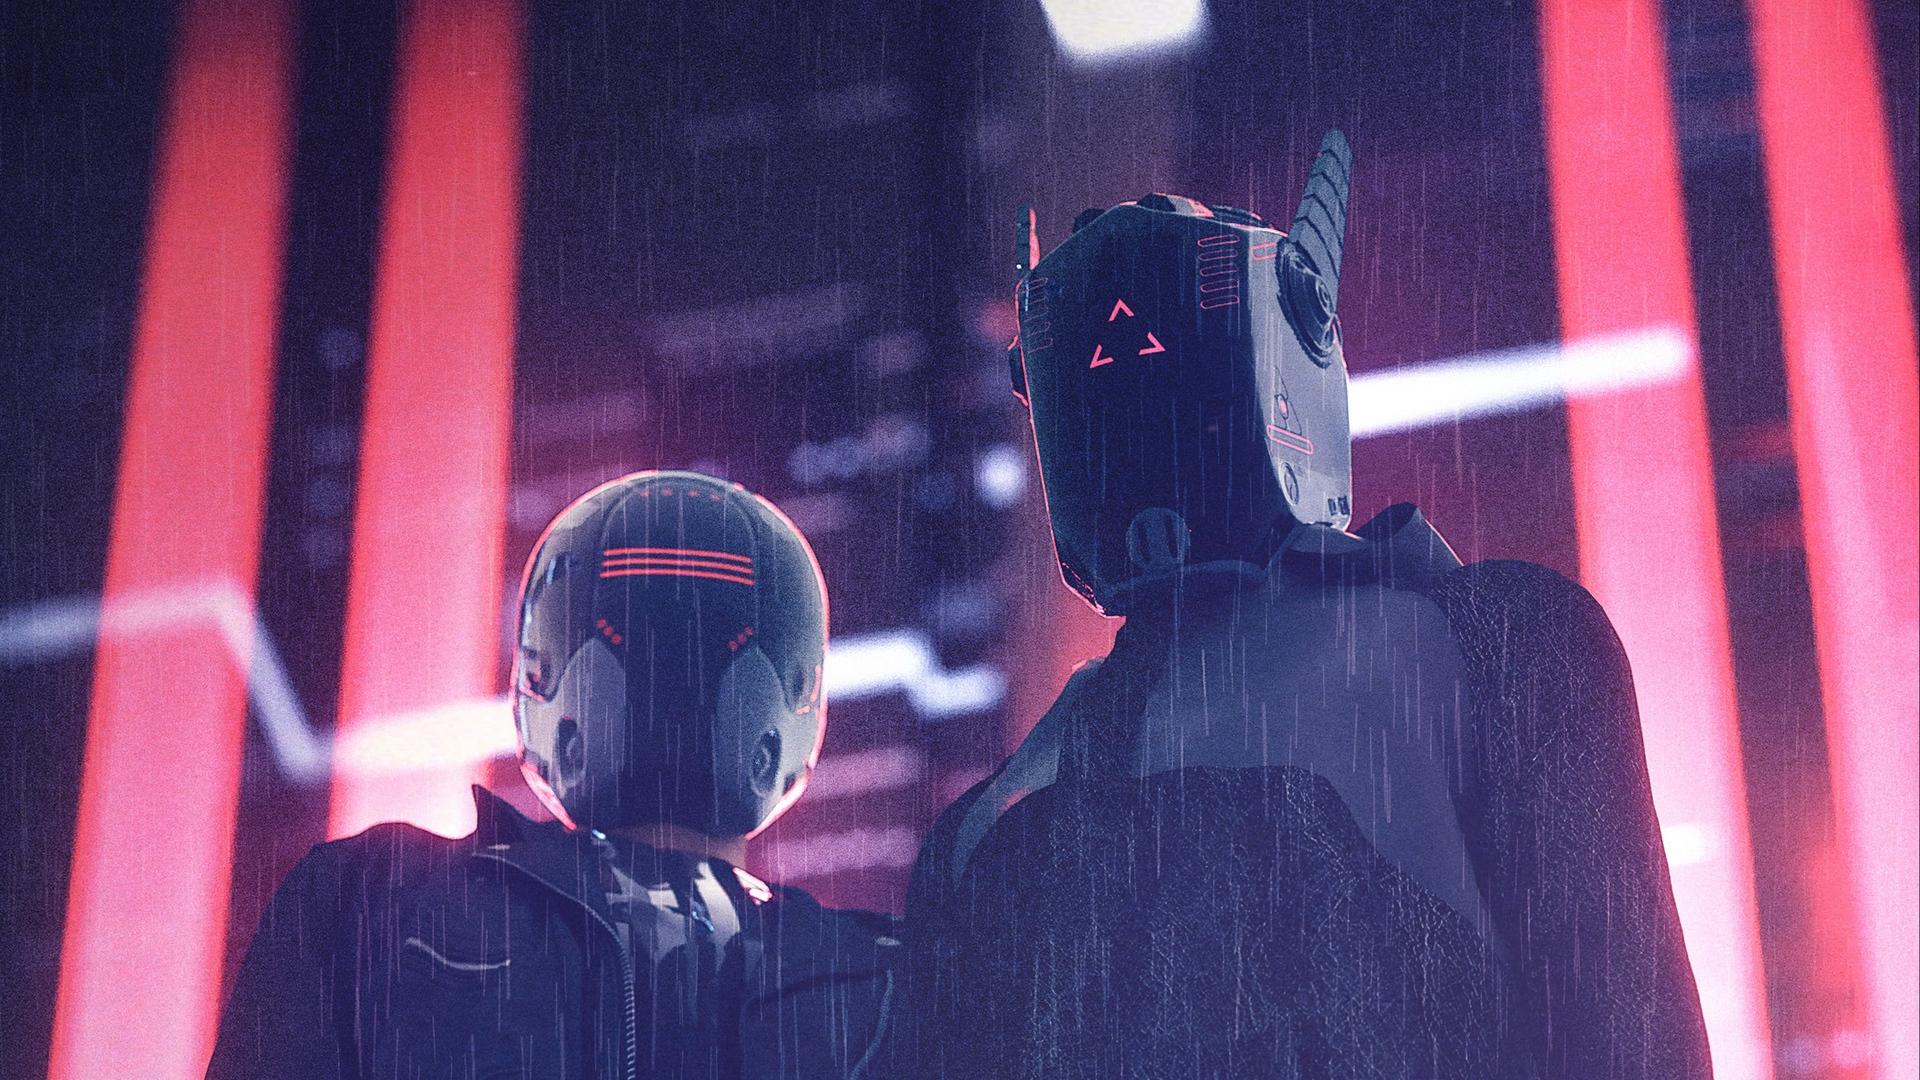 Cyberpunk Mask HD Wallpaper